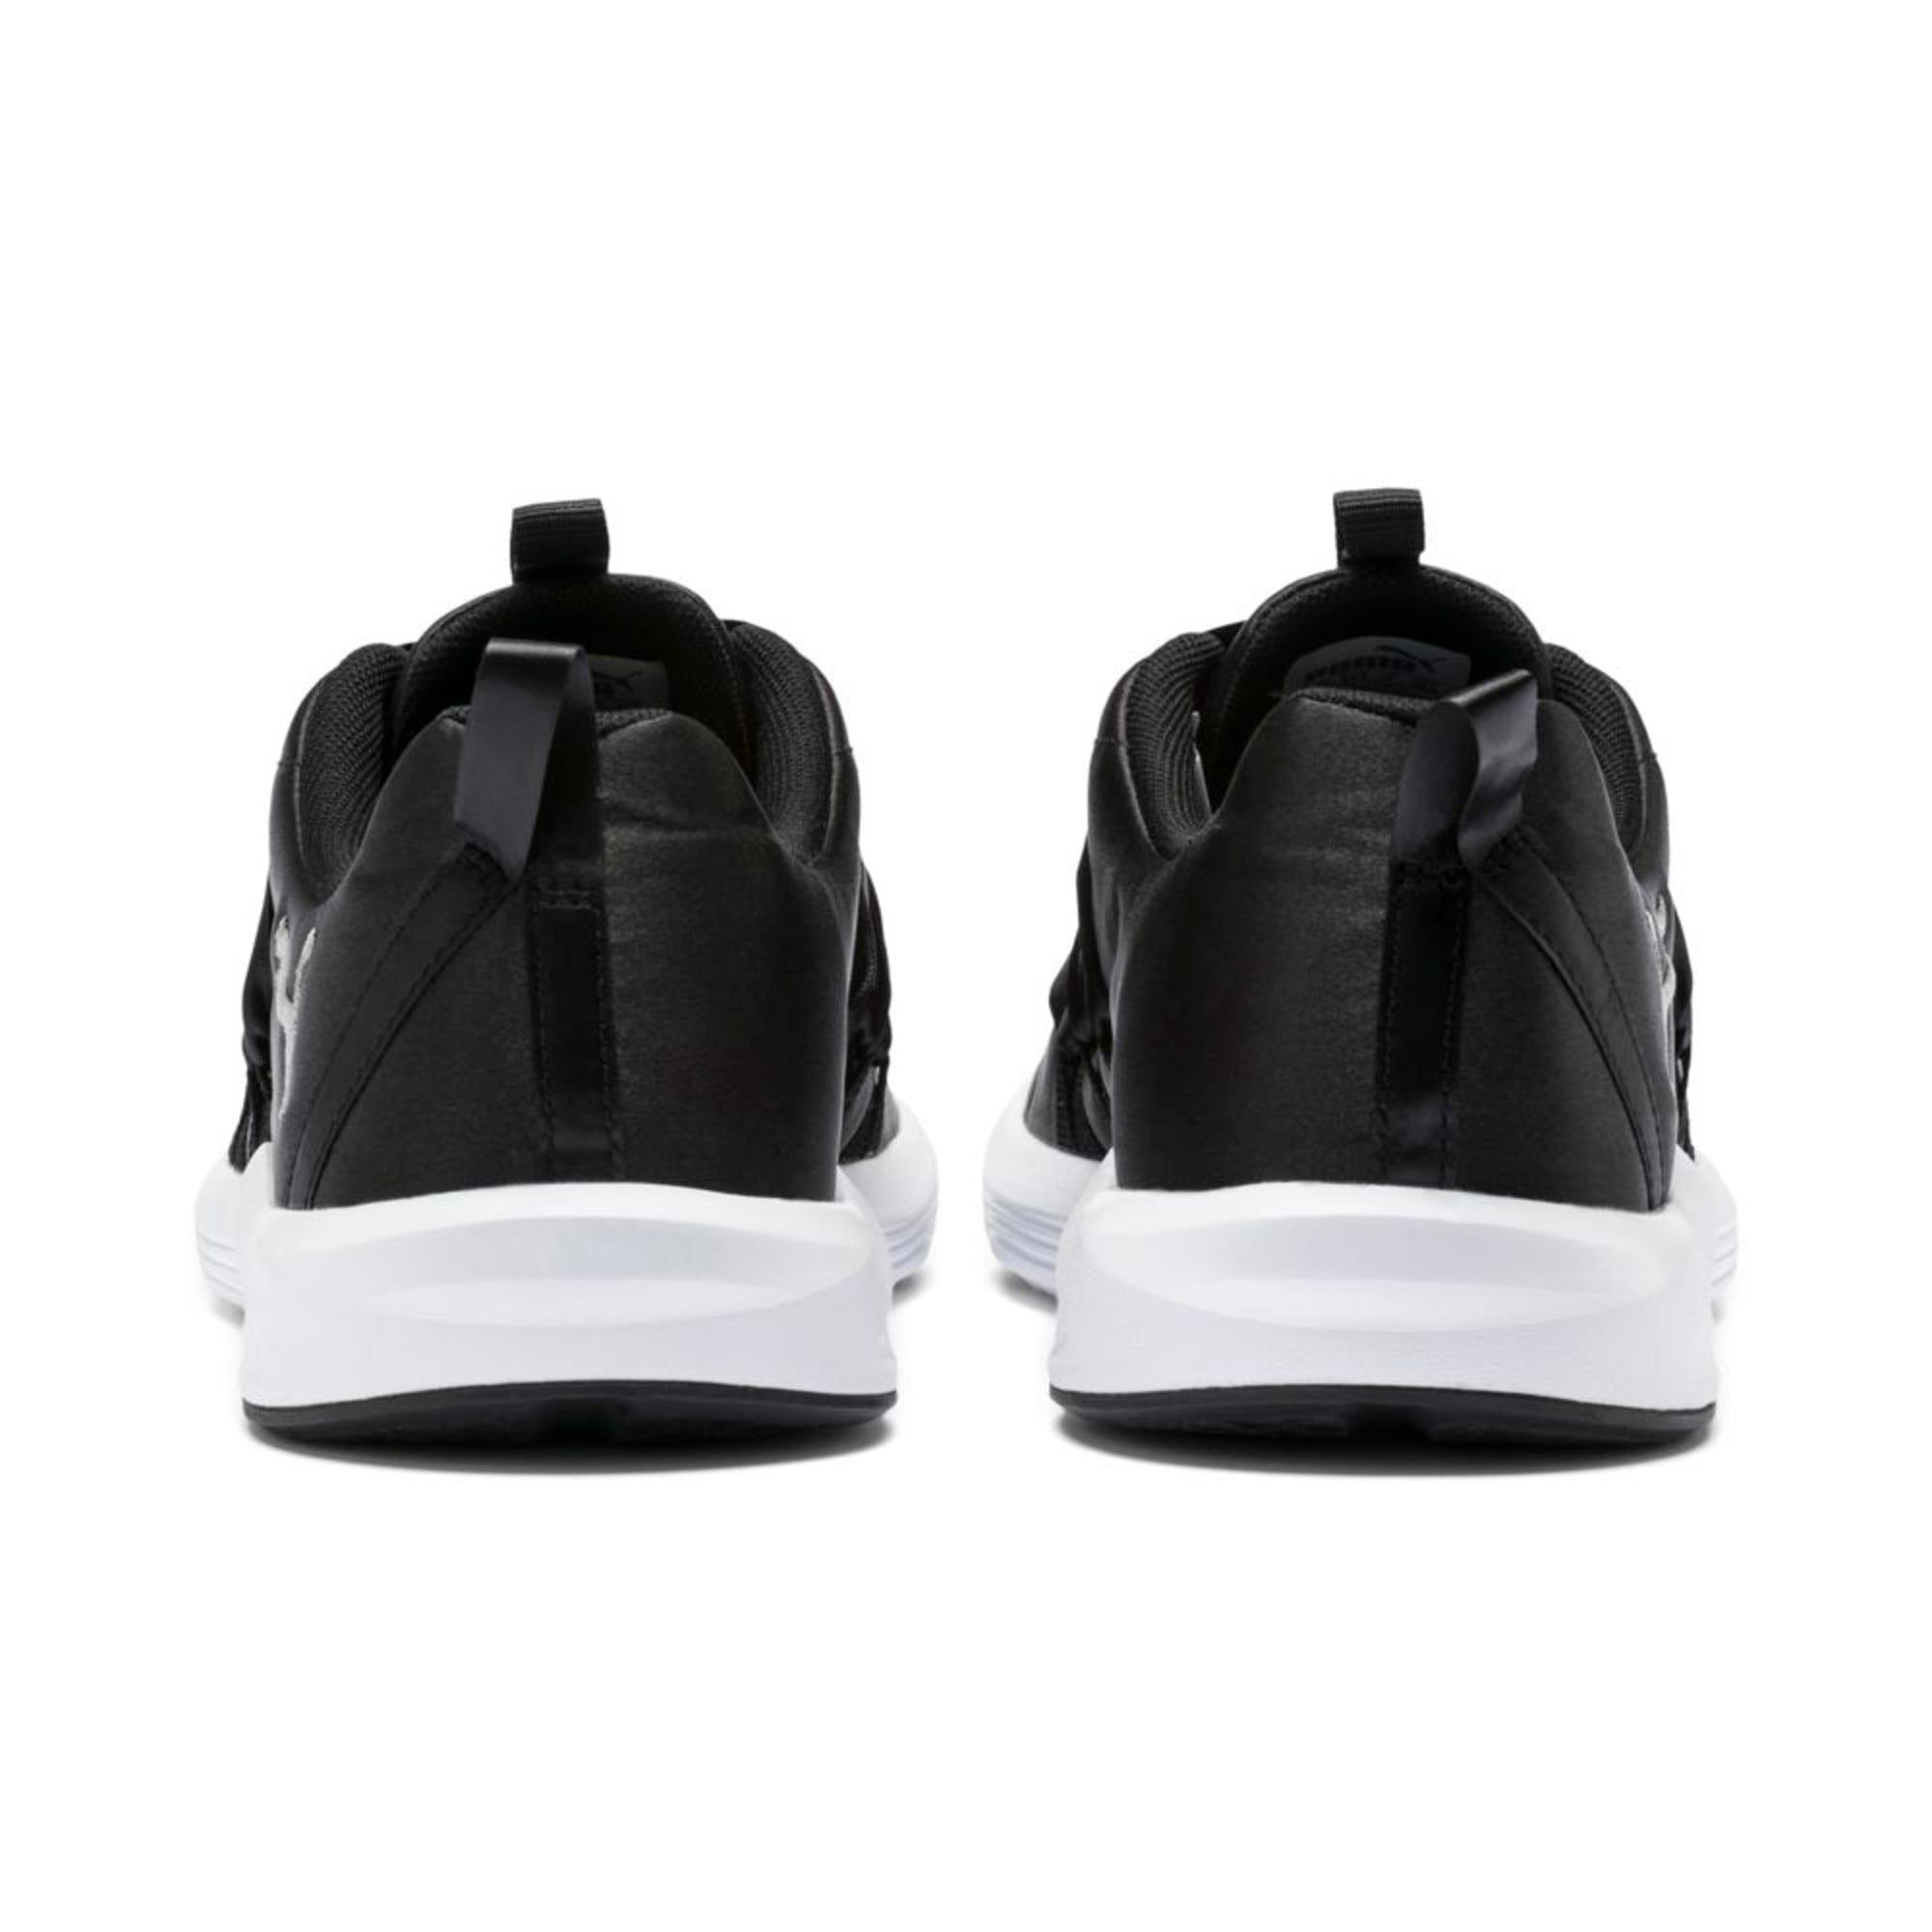 Thumbnail 4 of Prowl Alt Satin Women's Training Shoes, Puma Black-Puma White, medium-IND